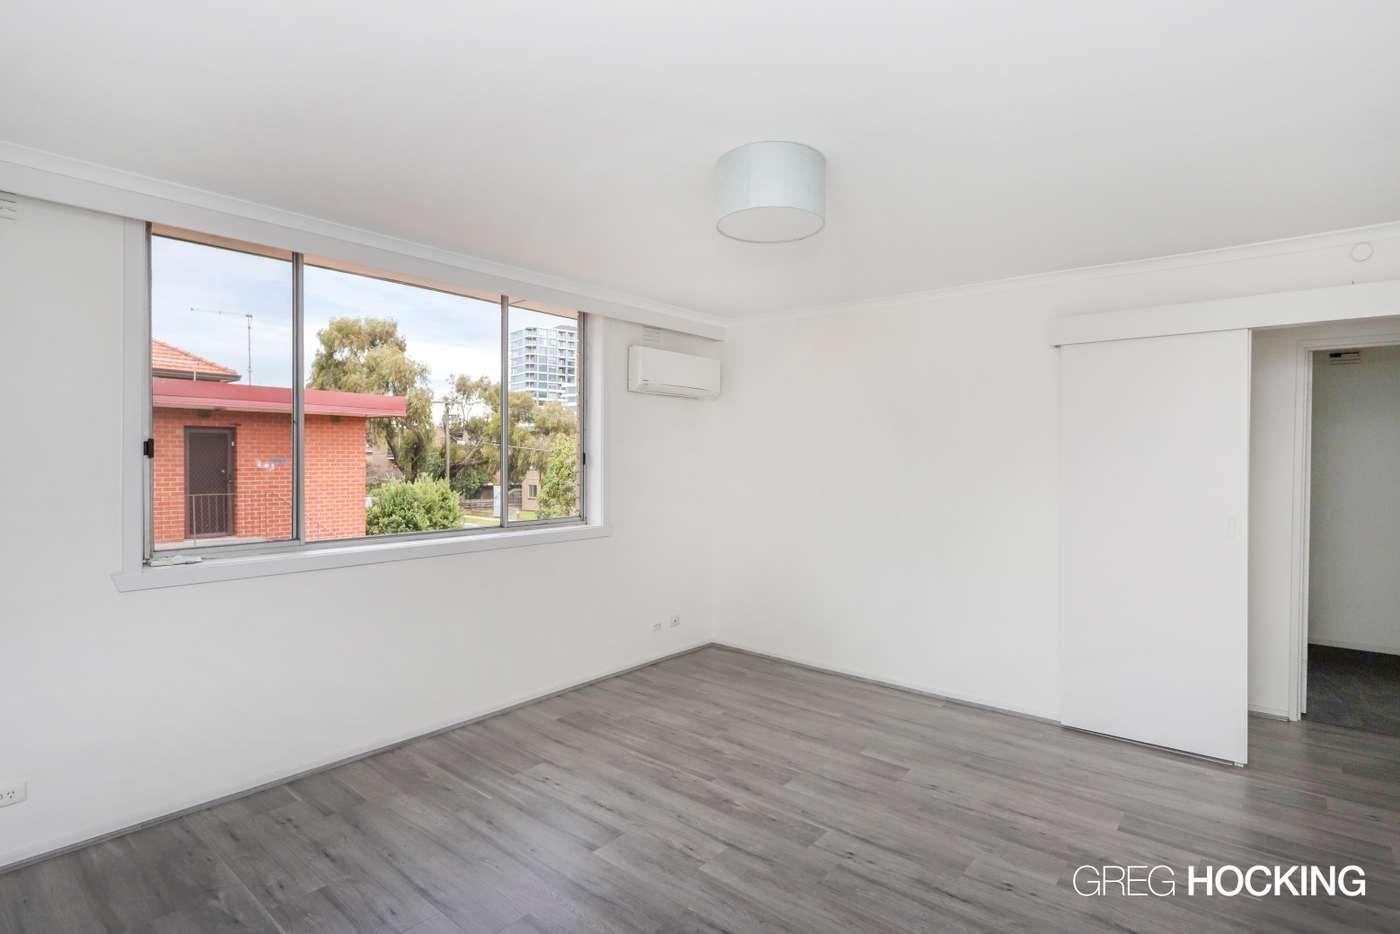 Main view of Homely apartment listing, 5/18 Eldridge Street, Footscray VIC 3011